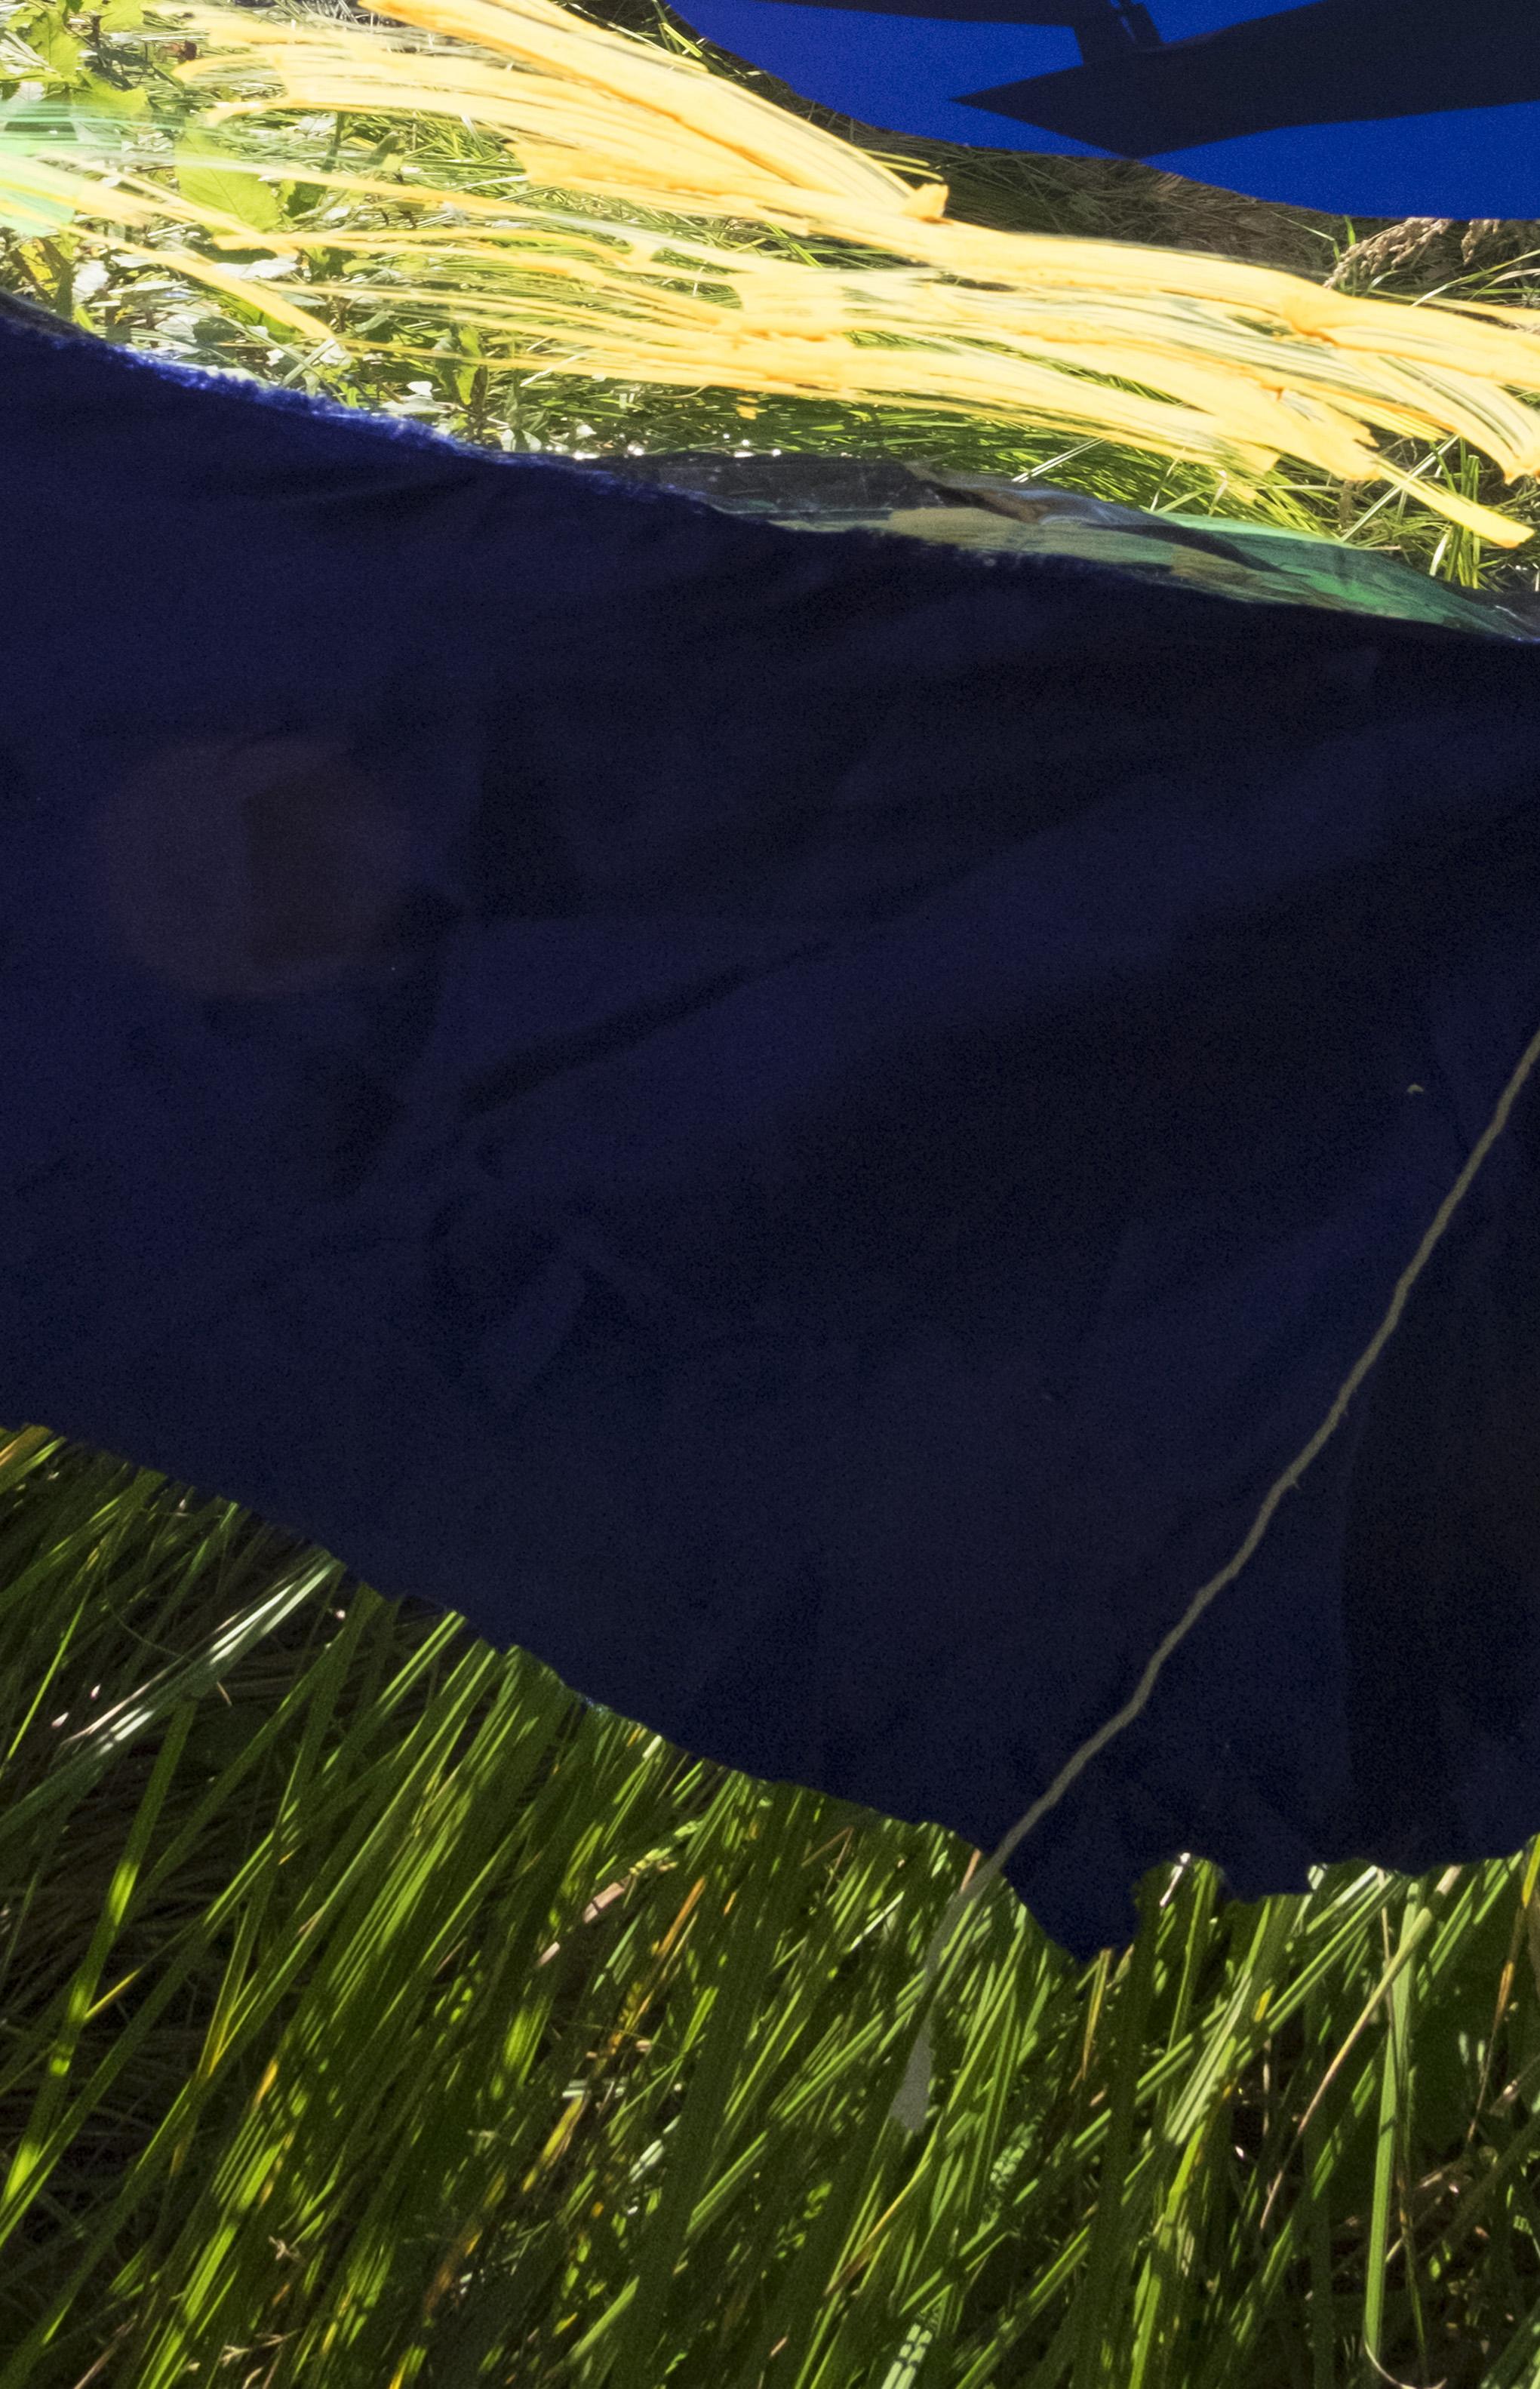 09.08.16 Tofte Lake (Grass)